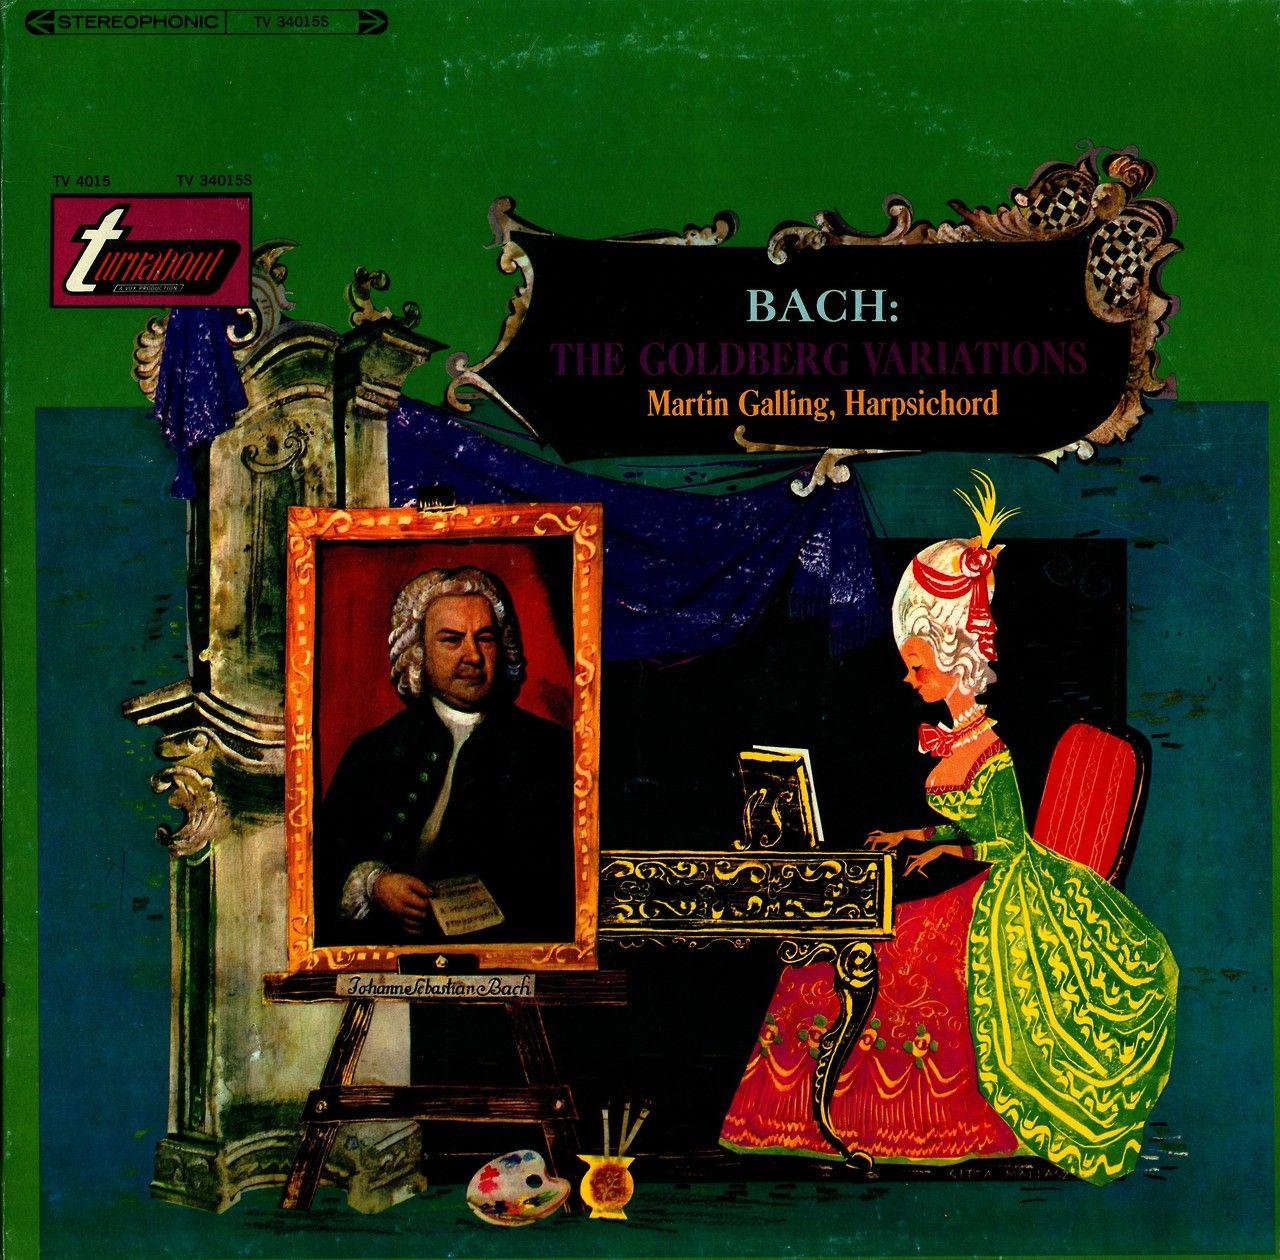 J.S. Bach- The Goldberg Variations   Martin Galling, harpsichord  Turnabout (Vox) TV 34015S (1966)  Album Art by Gitta Mallasz